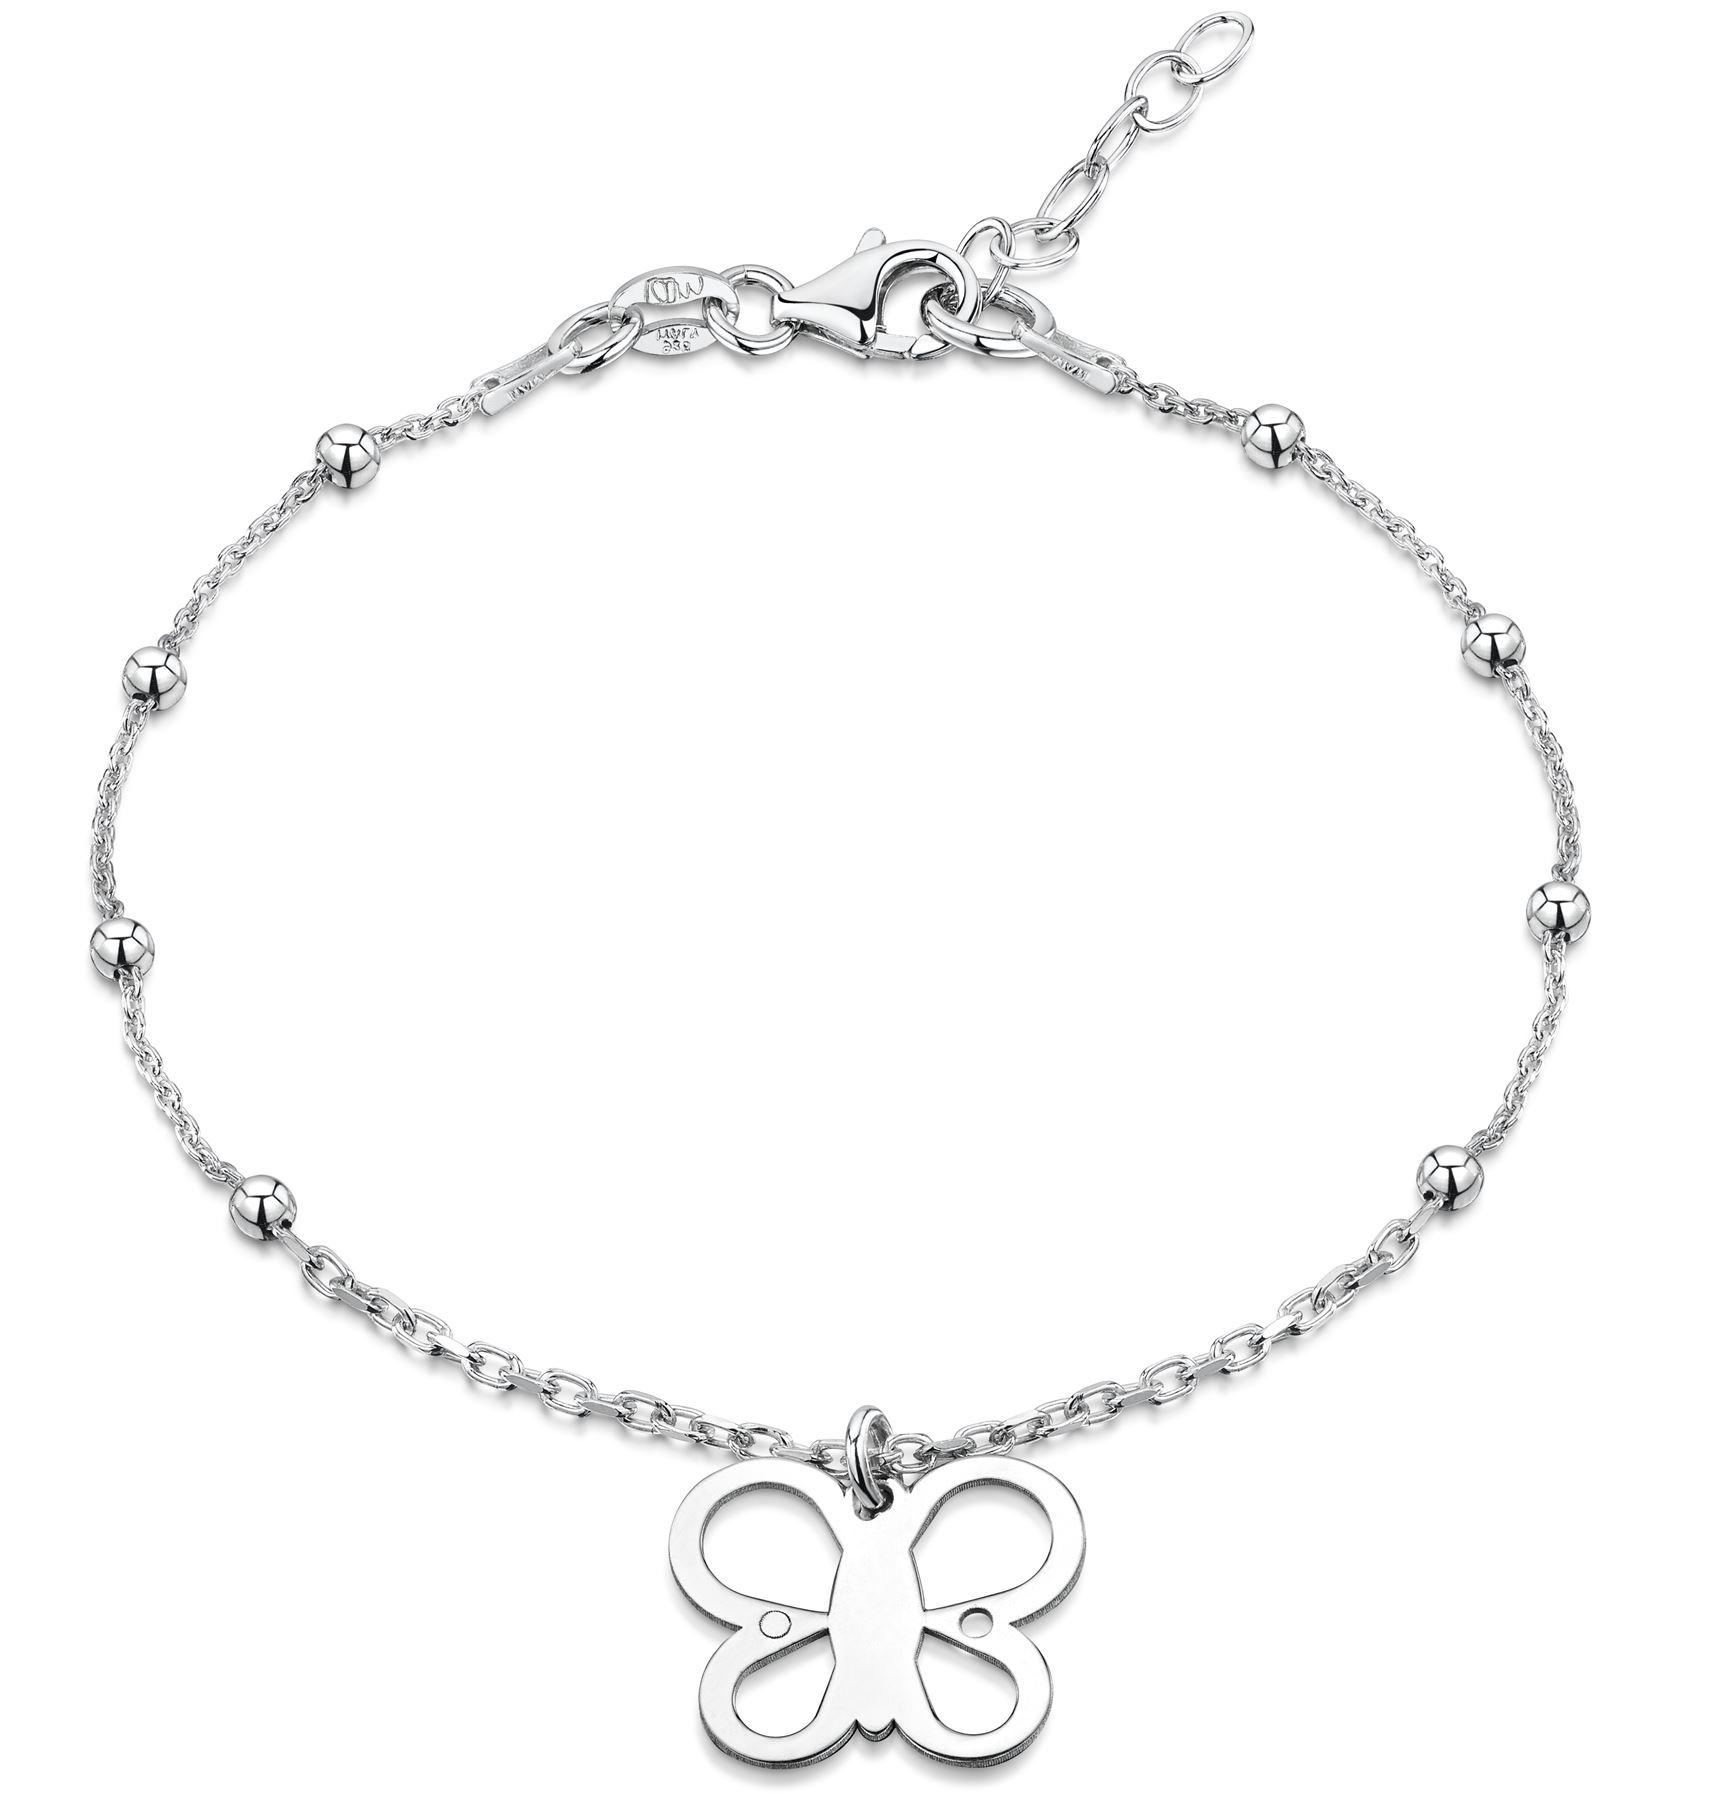 Amberta-Jewelry-925-Sterling-Silver-Adjustable-Bracelet-Italian-Bangle-for-Women thumbnail 47